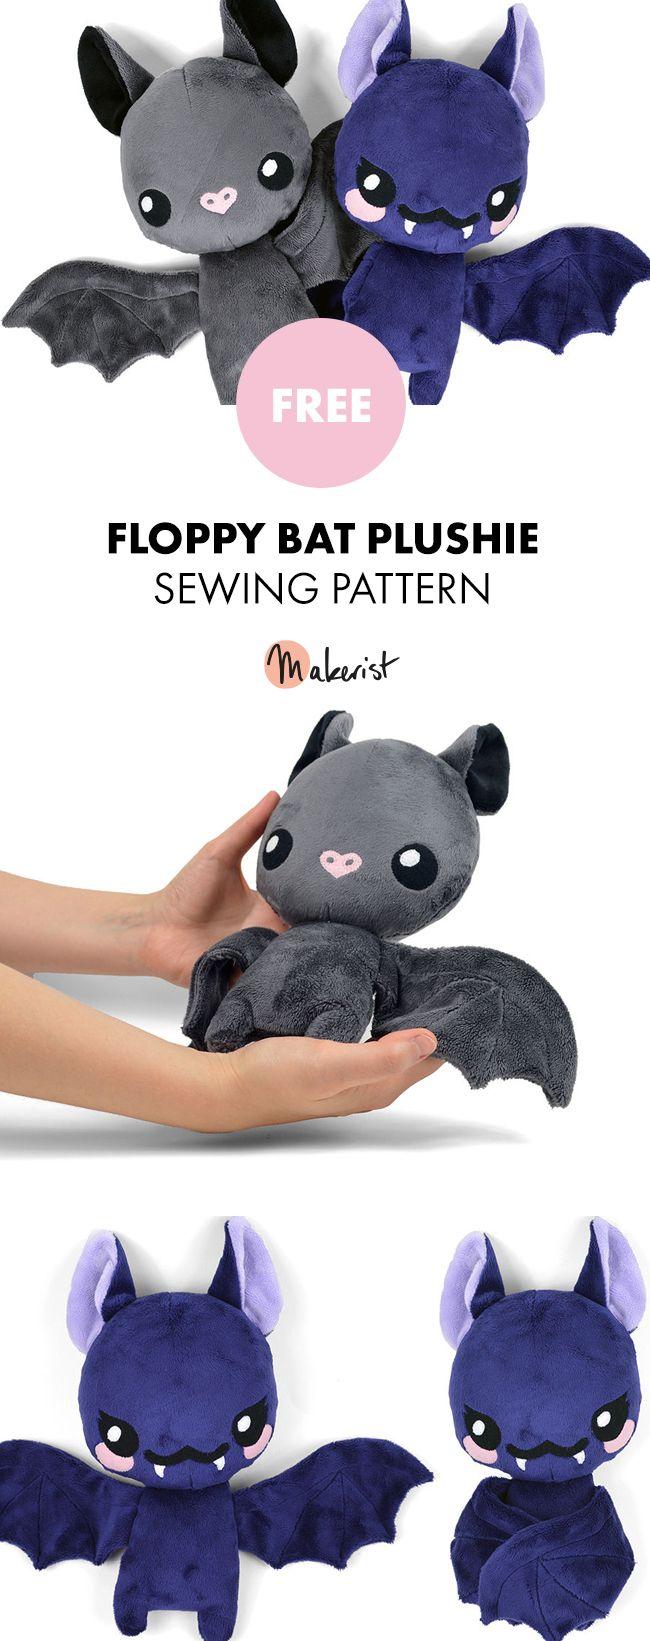 Floppy Bat Stuffed Animal Toy - Free Sewing Patterns via Makerist.com